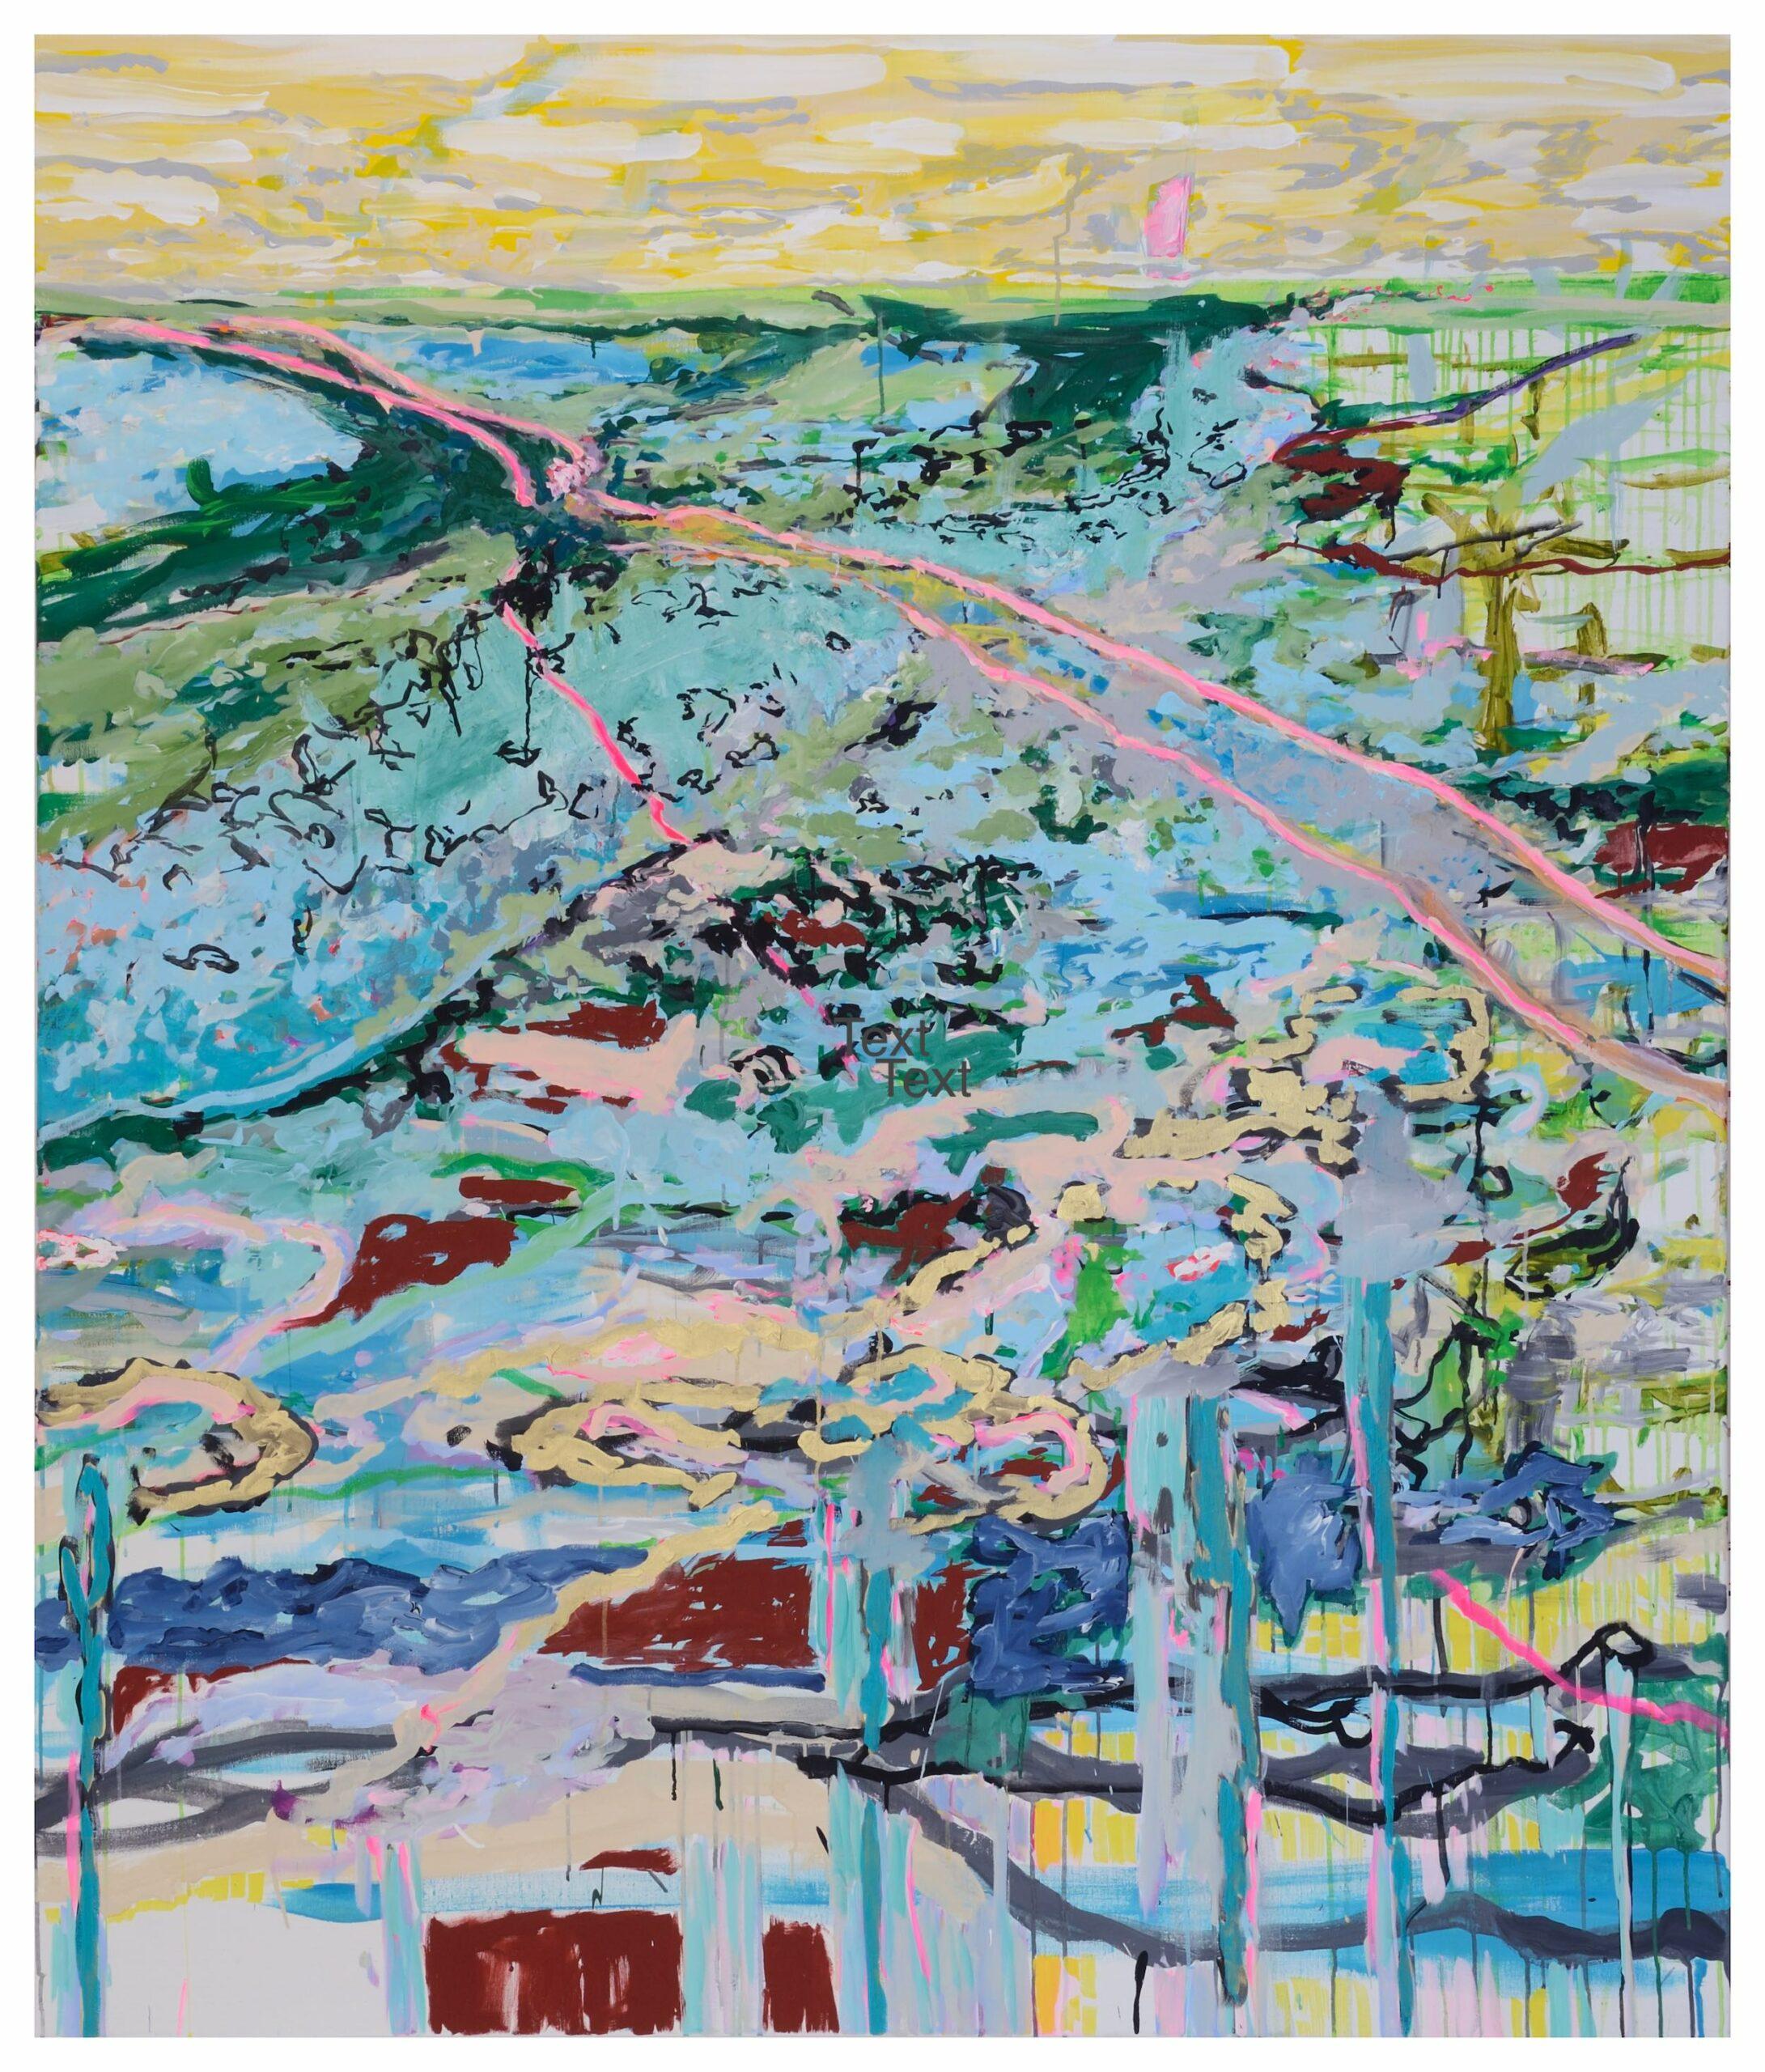 o.T. Acryl auf Leinwand, 190 x 160 cm